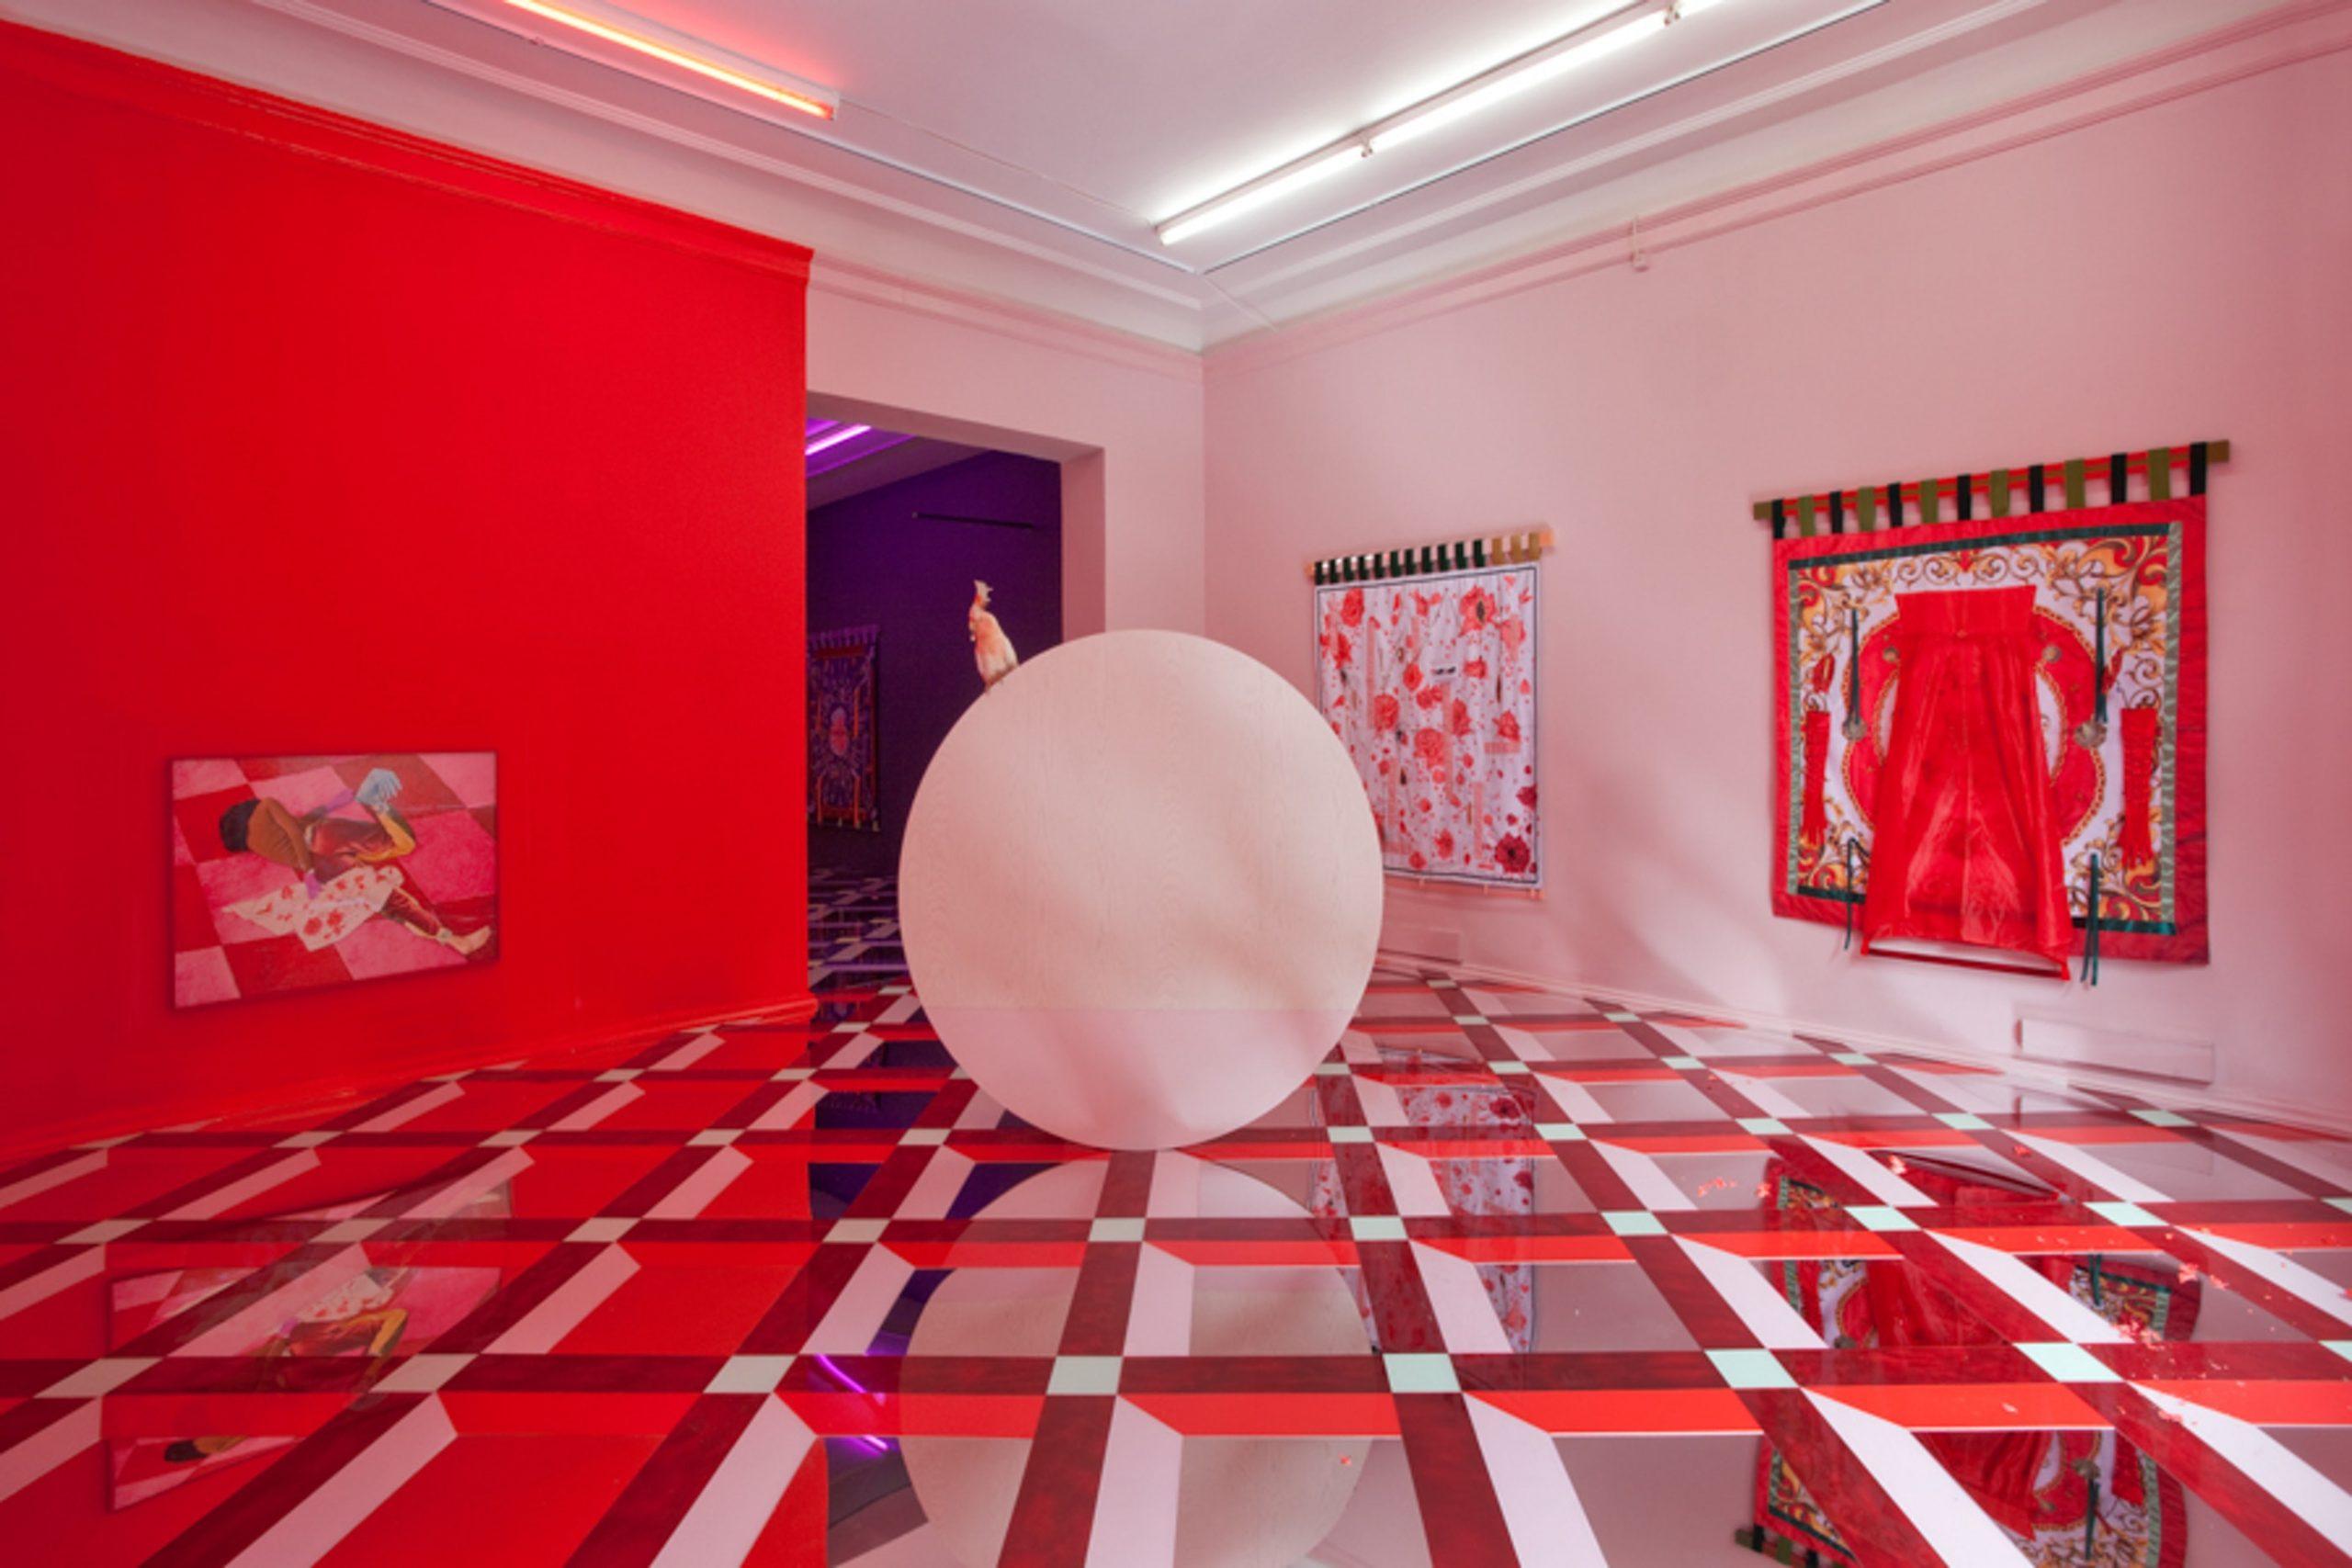 Opening tomorrow, Alex Da Corte's new off-site Hammer Museum show is a site-specific multimedia installation, incorporating a survey of recent video work. Pictured: Delirium I, David Risley Gallery, Copenhagen, 2014.